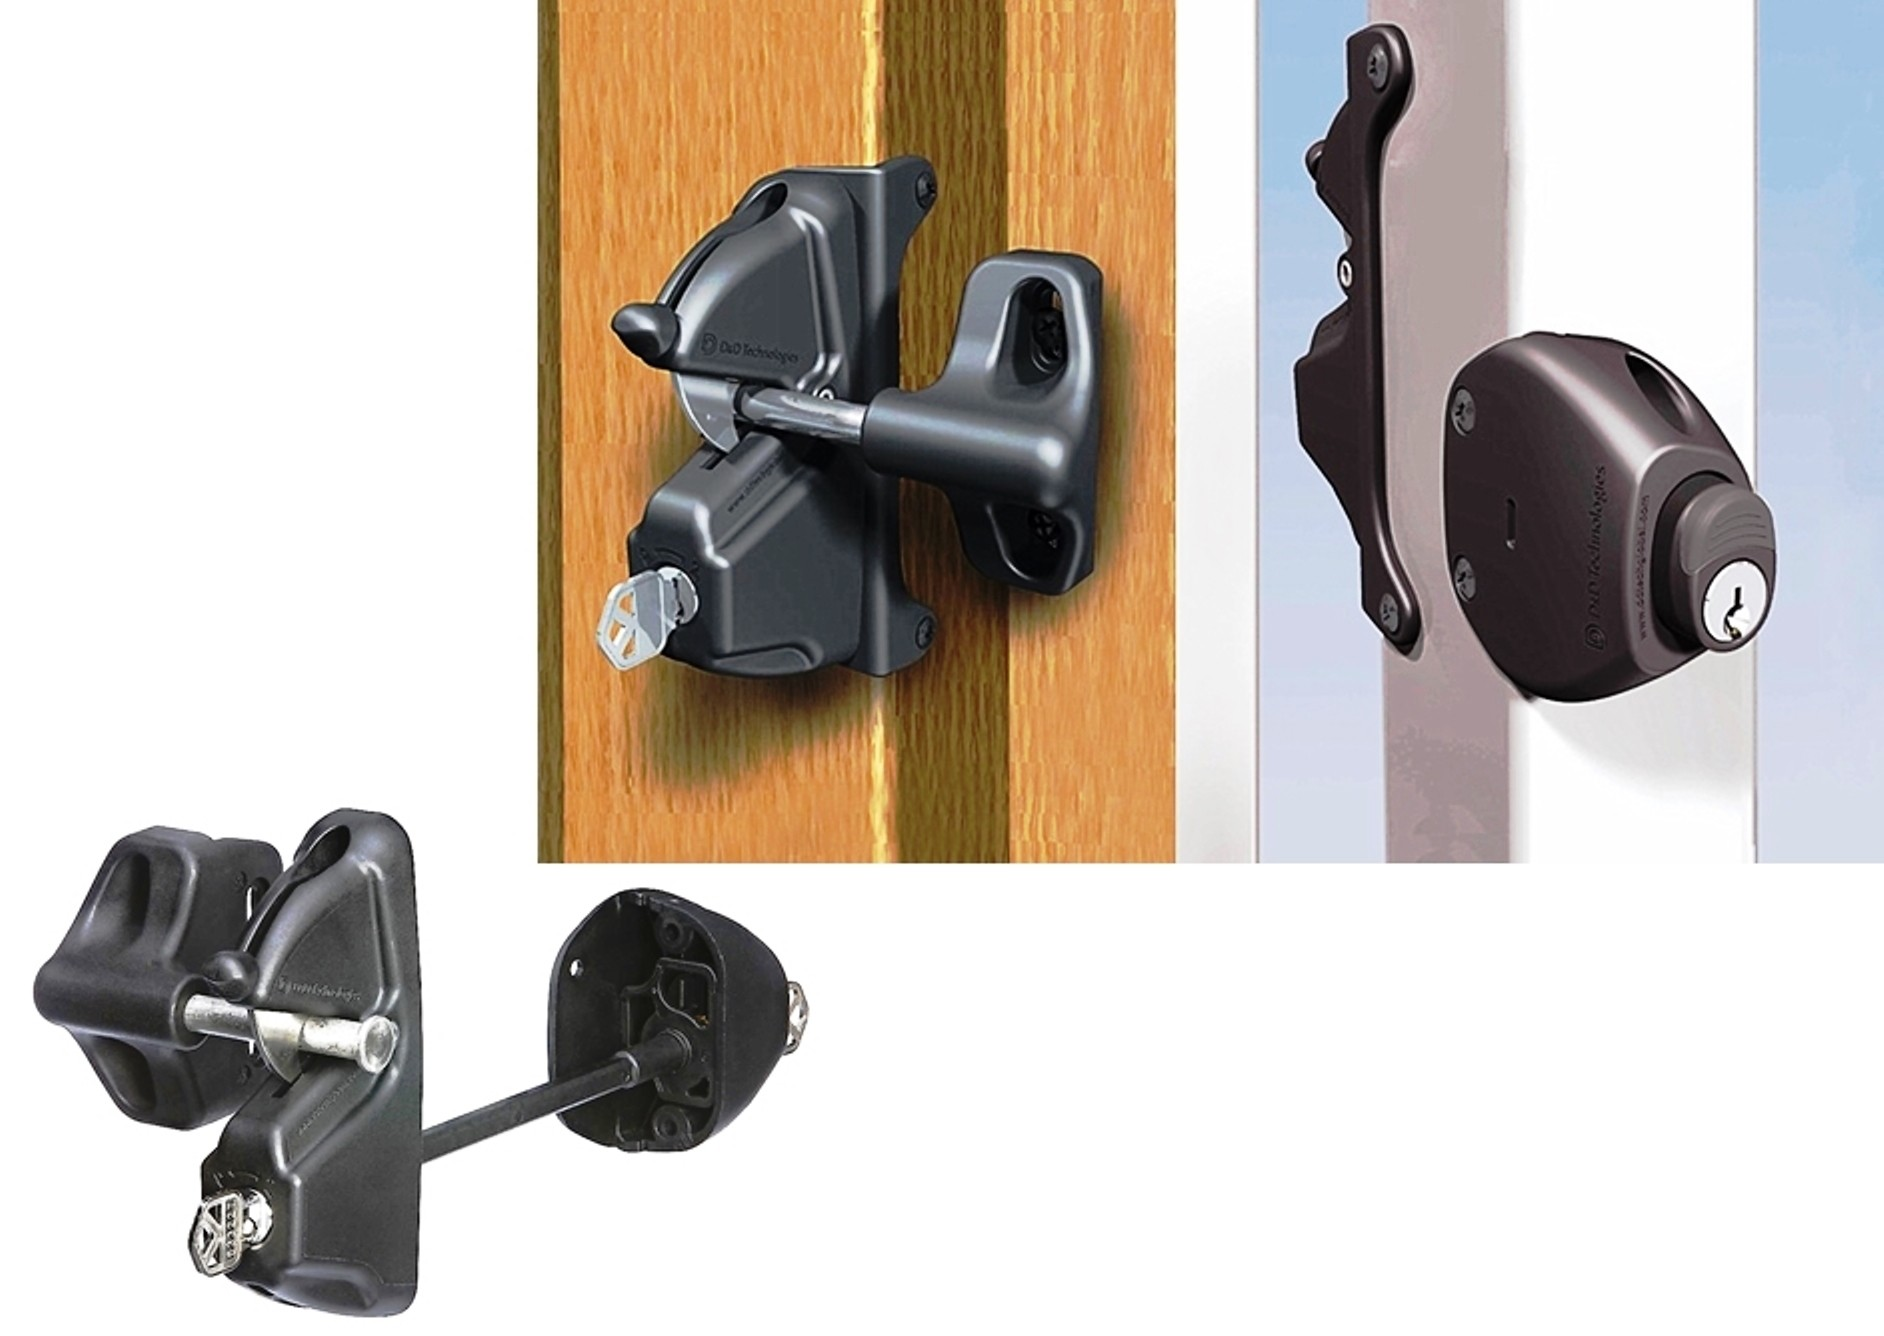 Buy The National 346528 Lokklatch 174 Deluxe Locking Gate